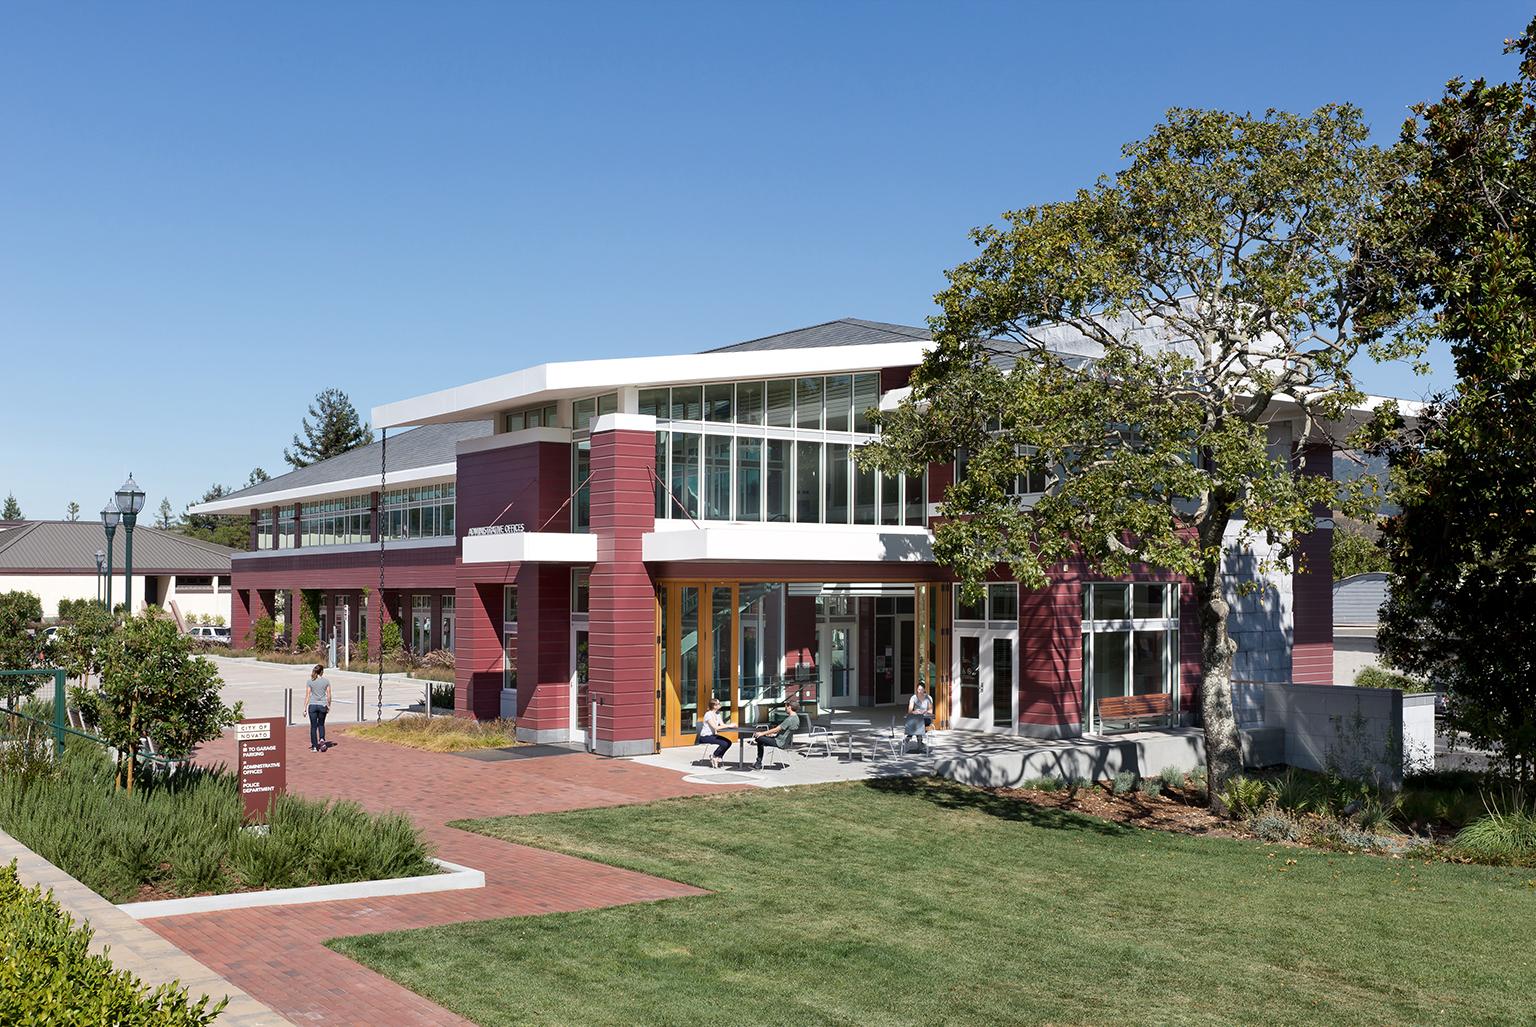 Novato Civic Center City Administration Office Building